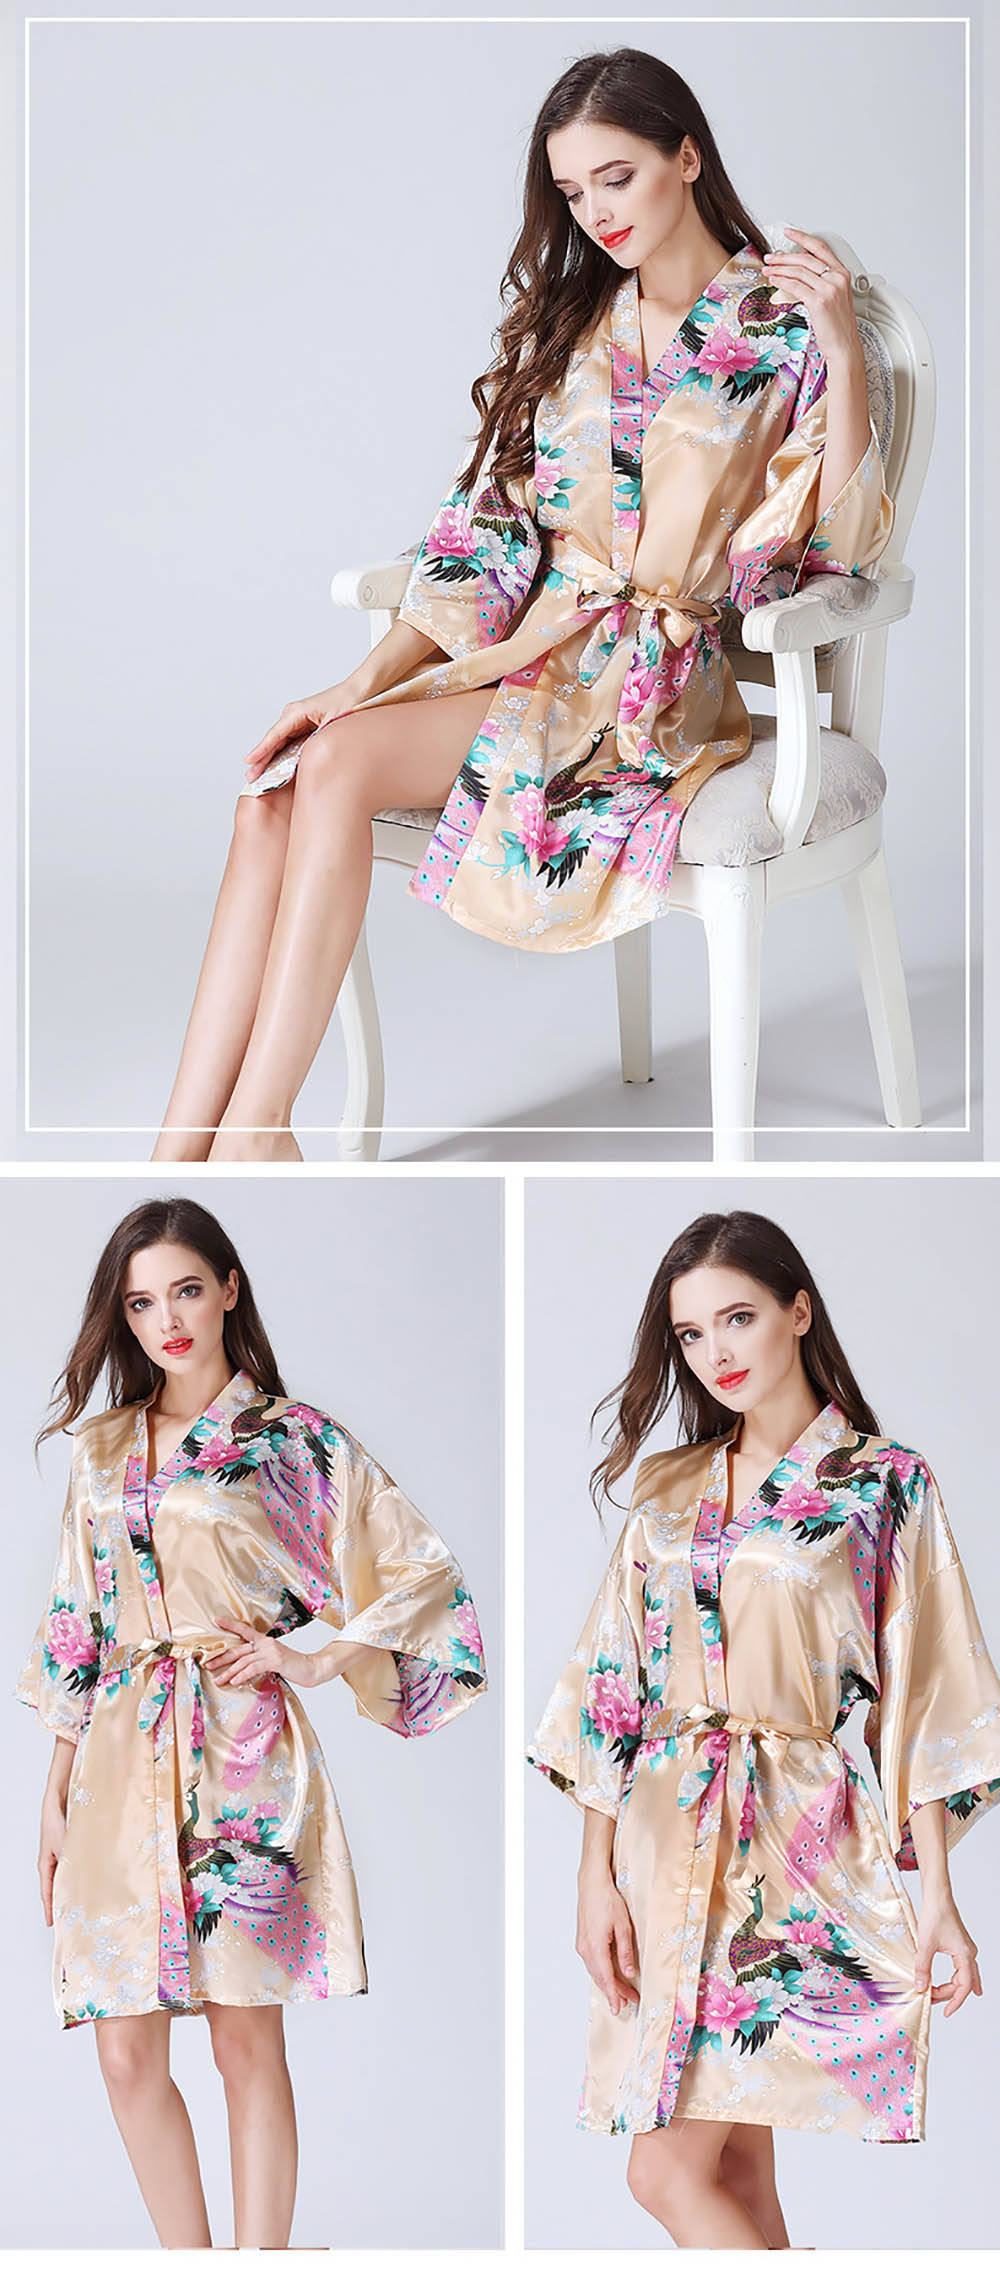 Frauen Satin Short Floral Kimono Bademantel Morgenmantel Pfau ...